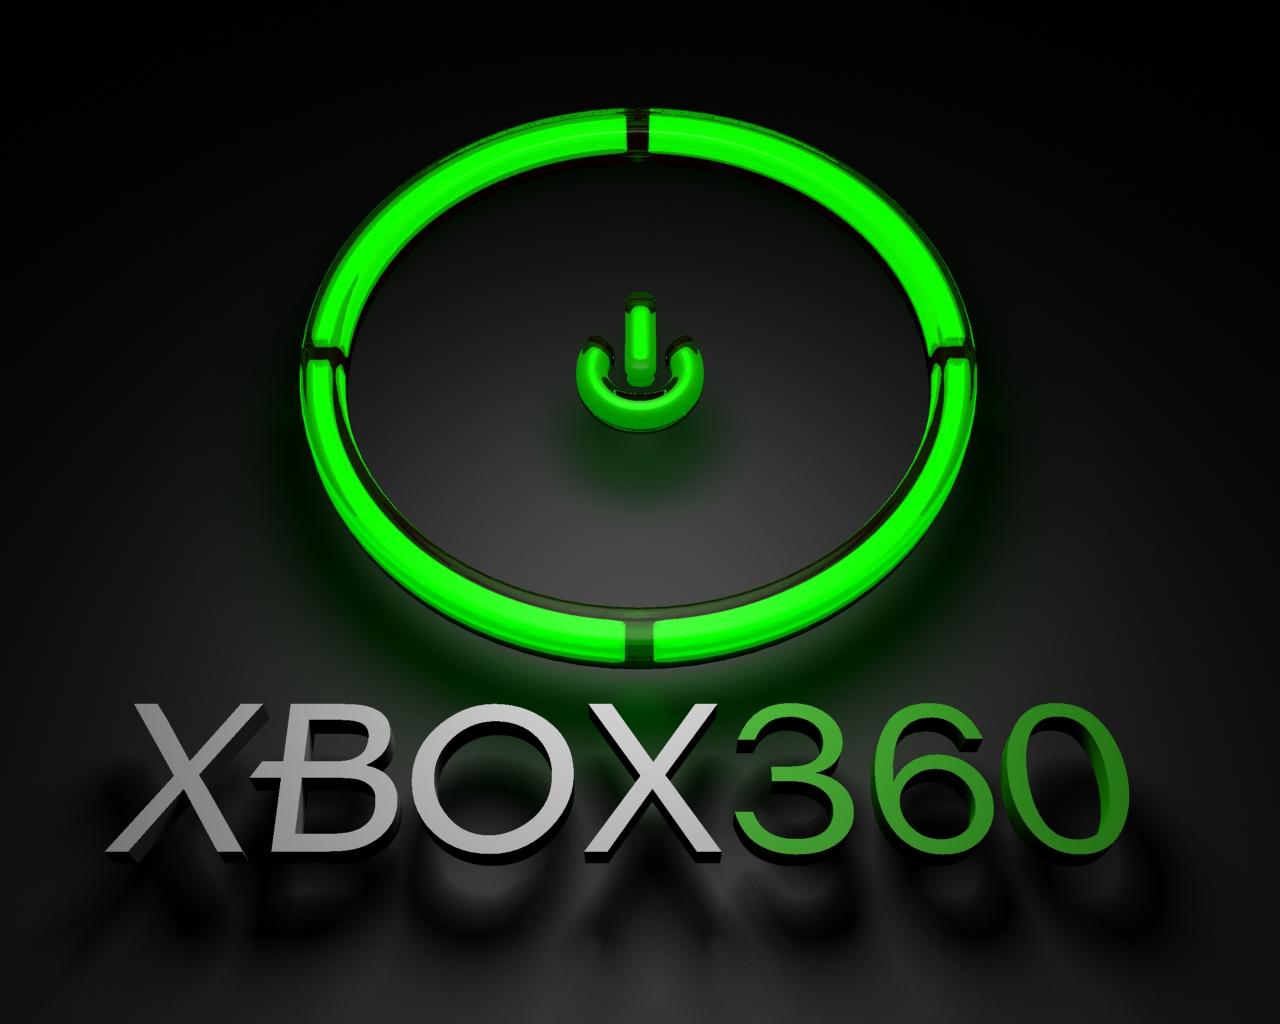 xbox 360 green ring power title wallpaper background desktop logo 1280x1024